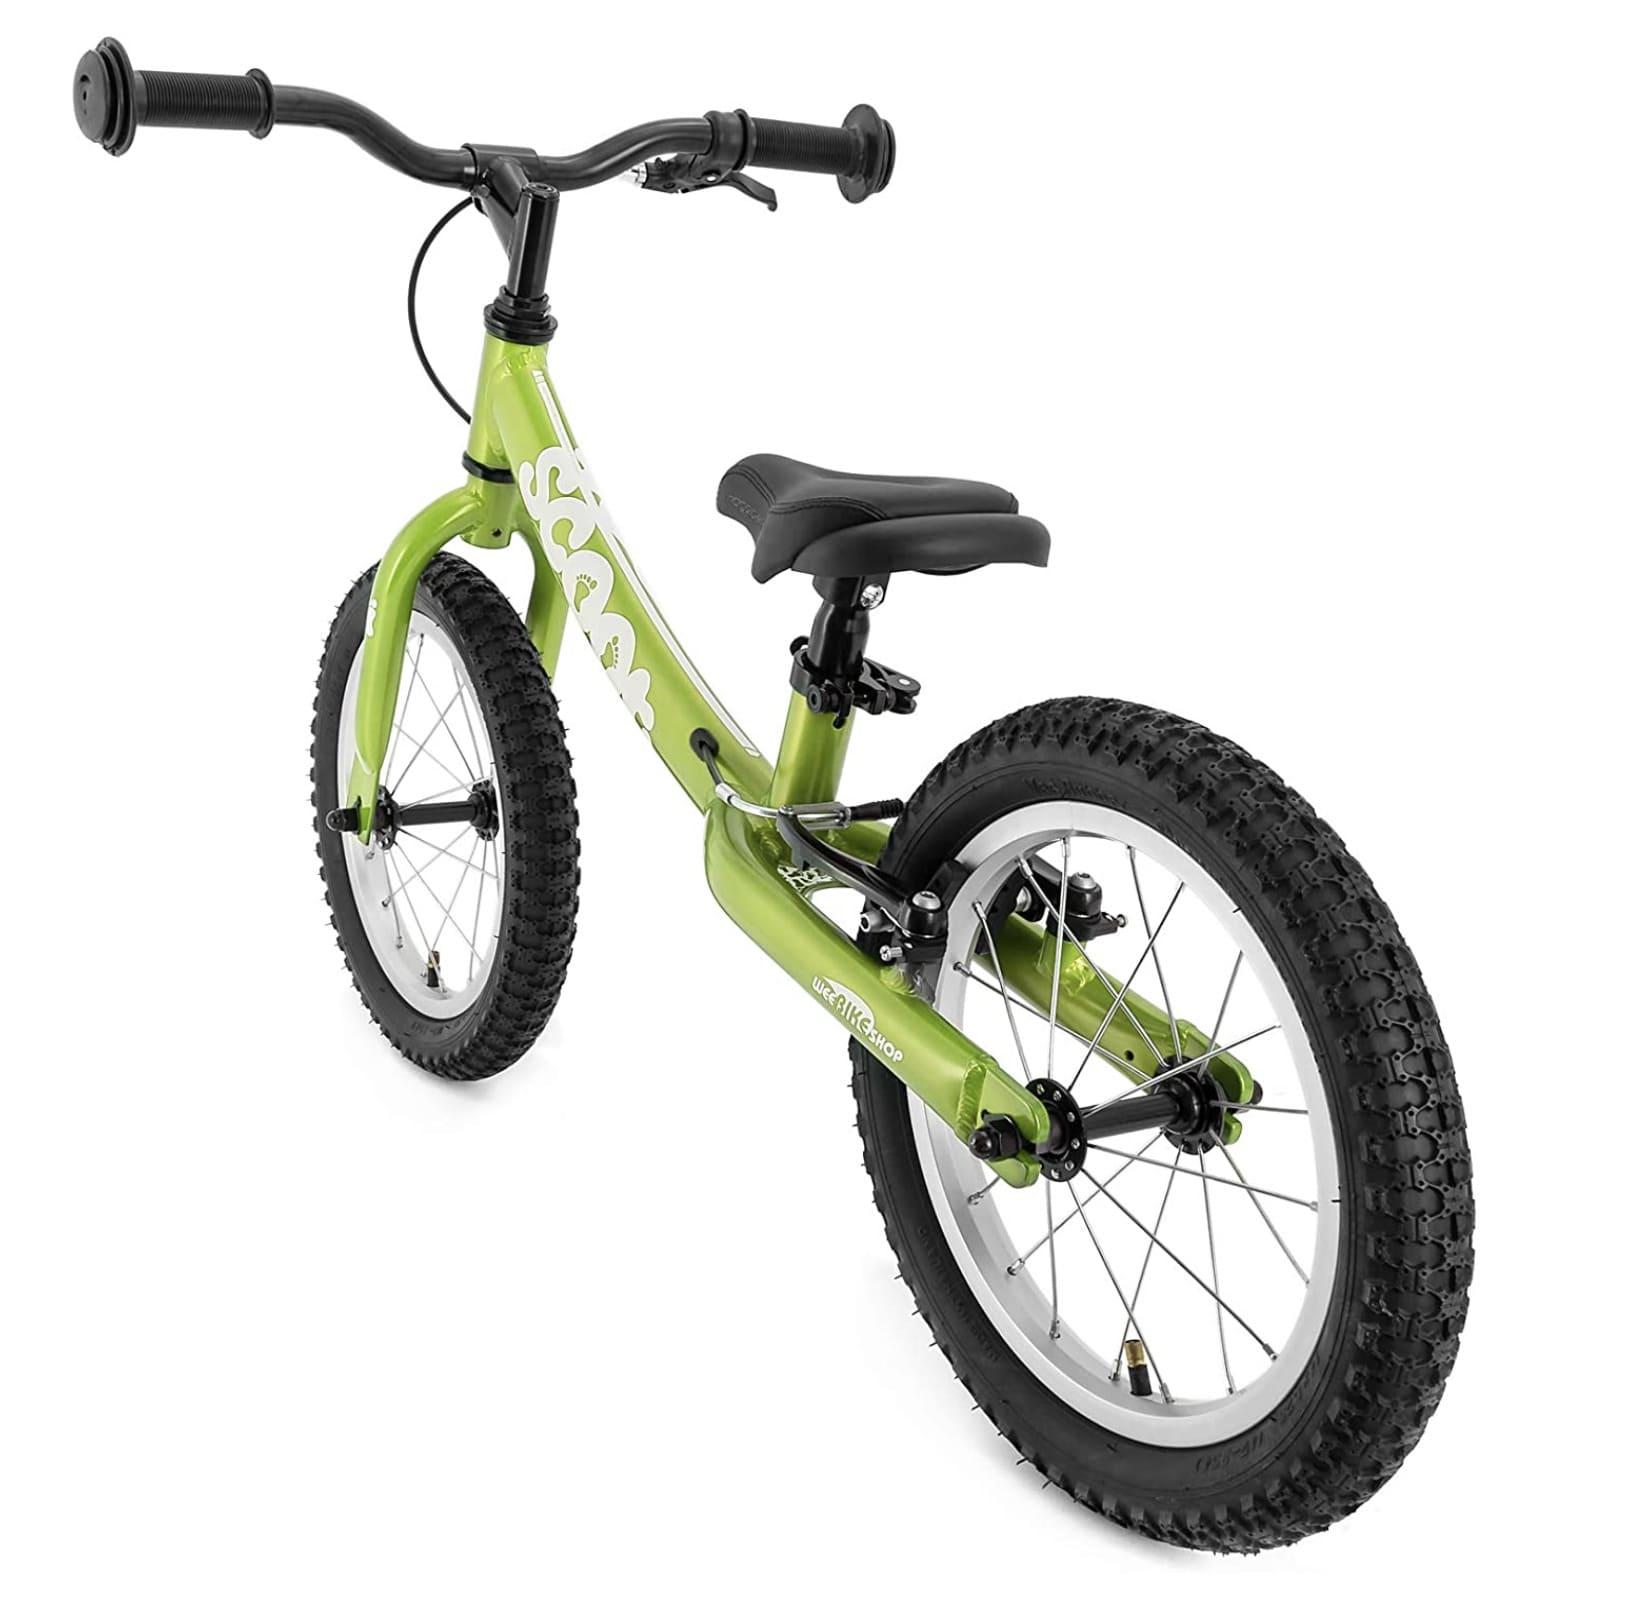 Bicicleta sin pedales para niño Rigdeback Scoot XL vista desde atrás